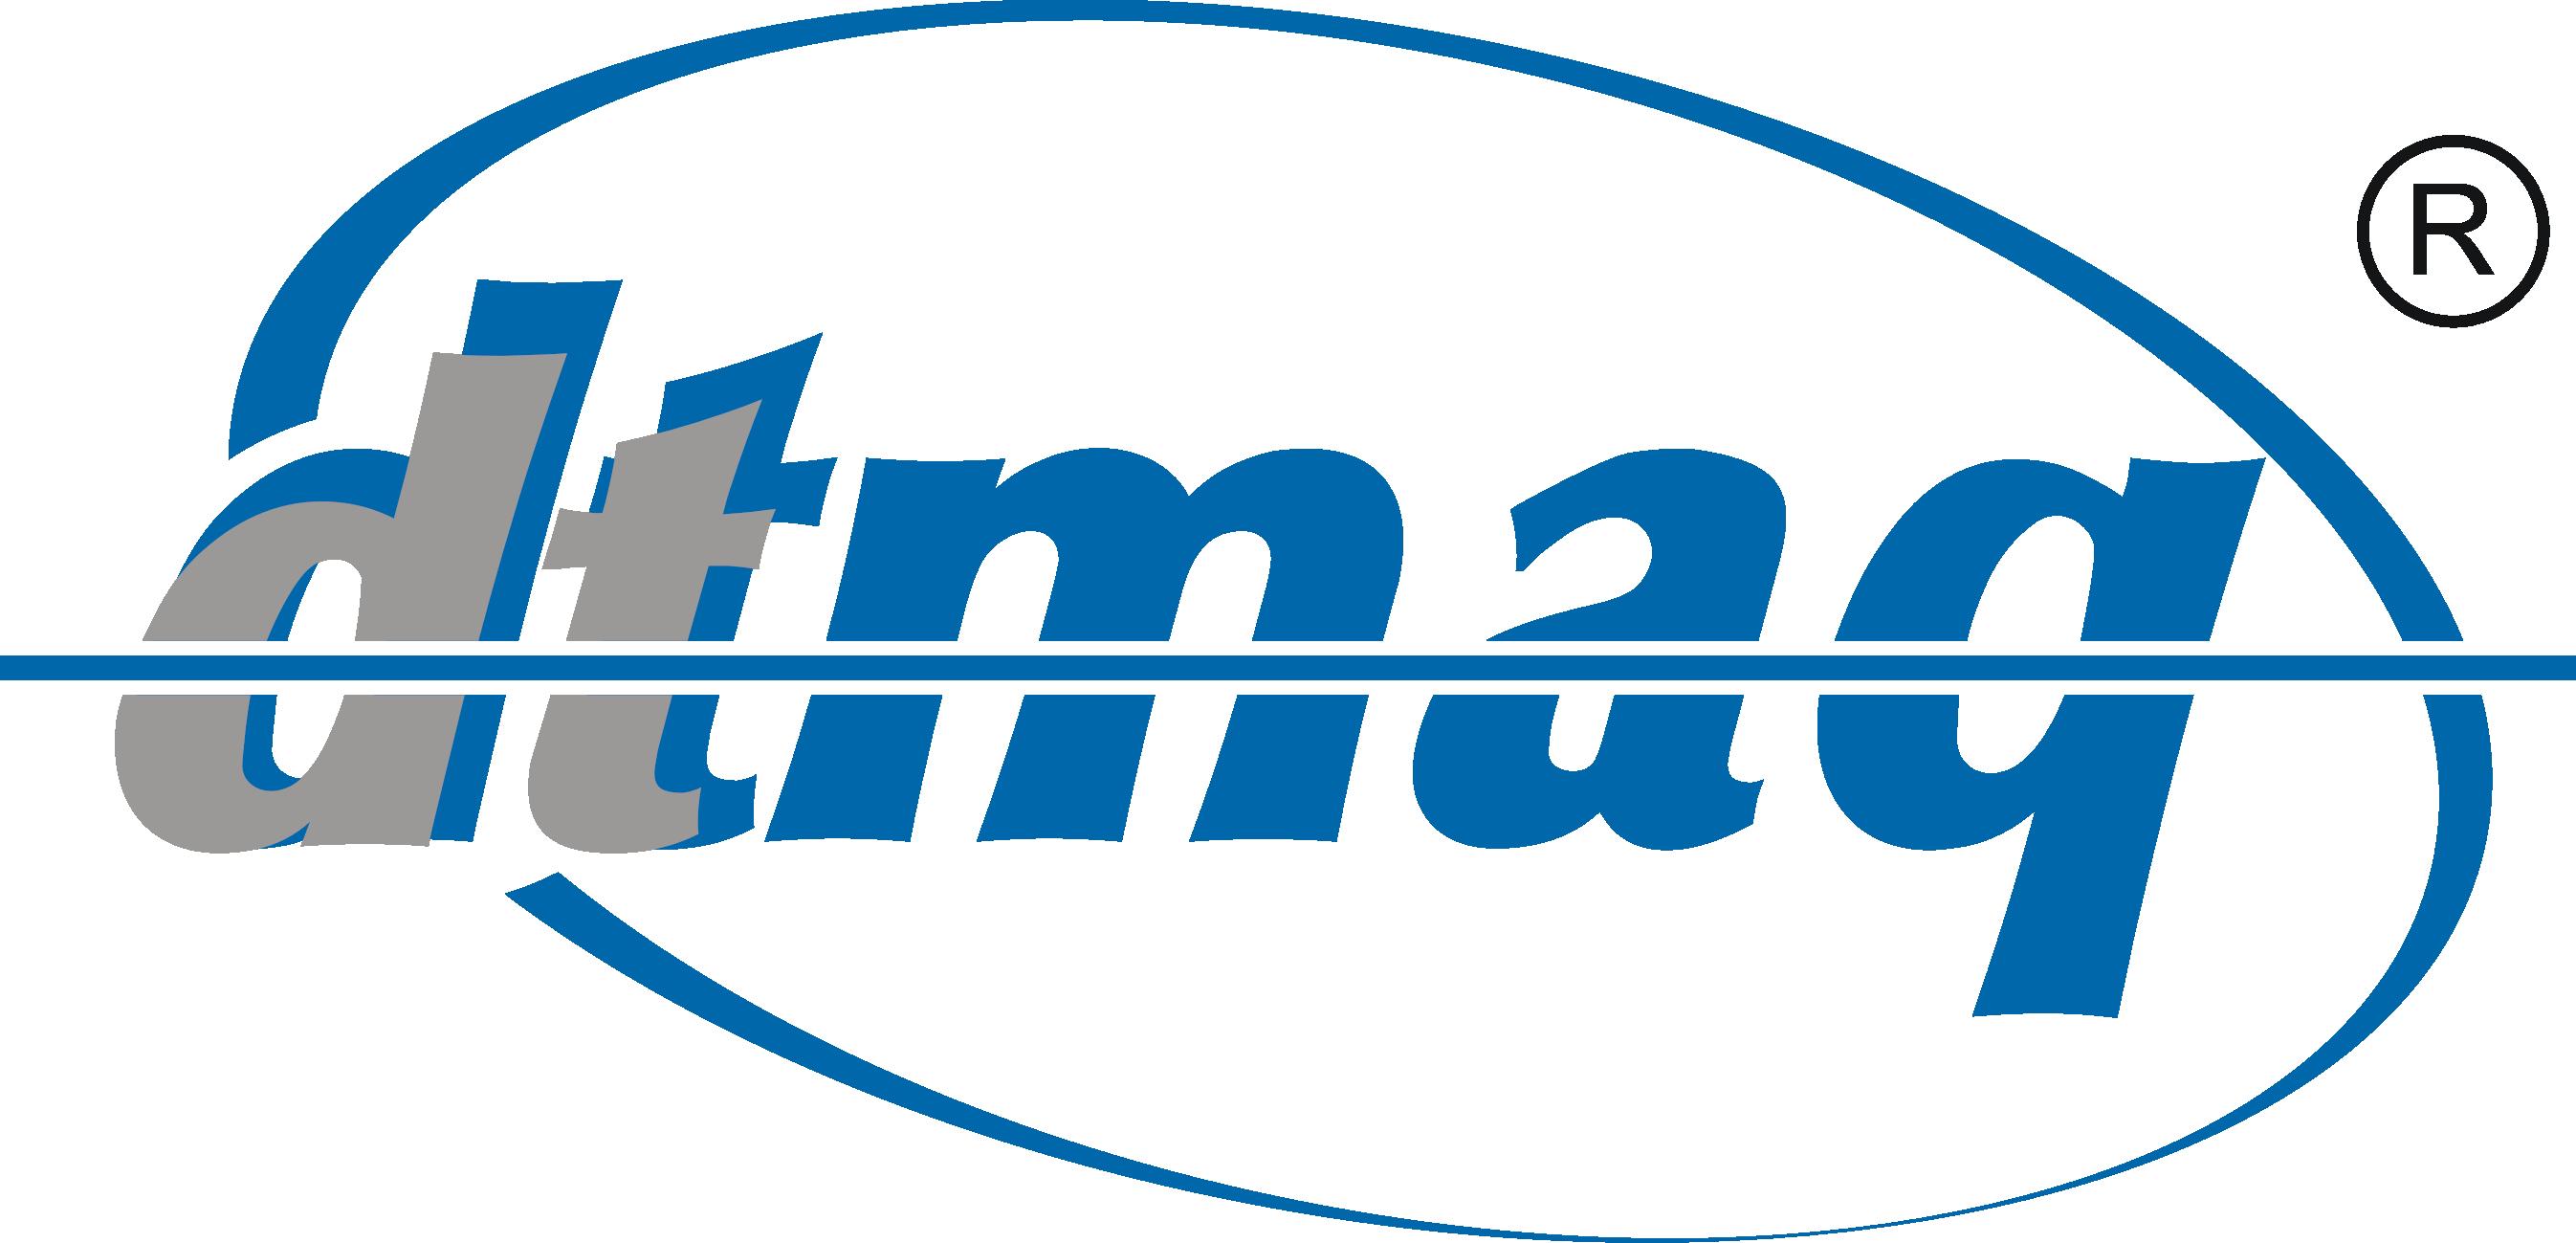 Dtmaq Logo Hd